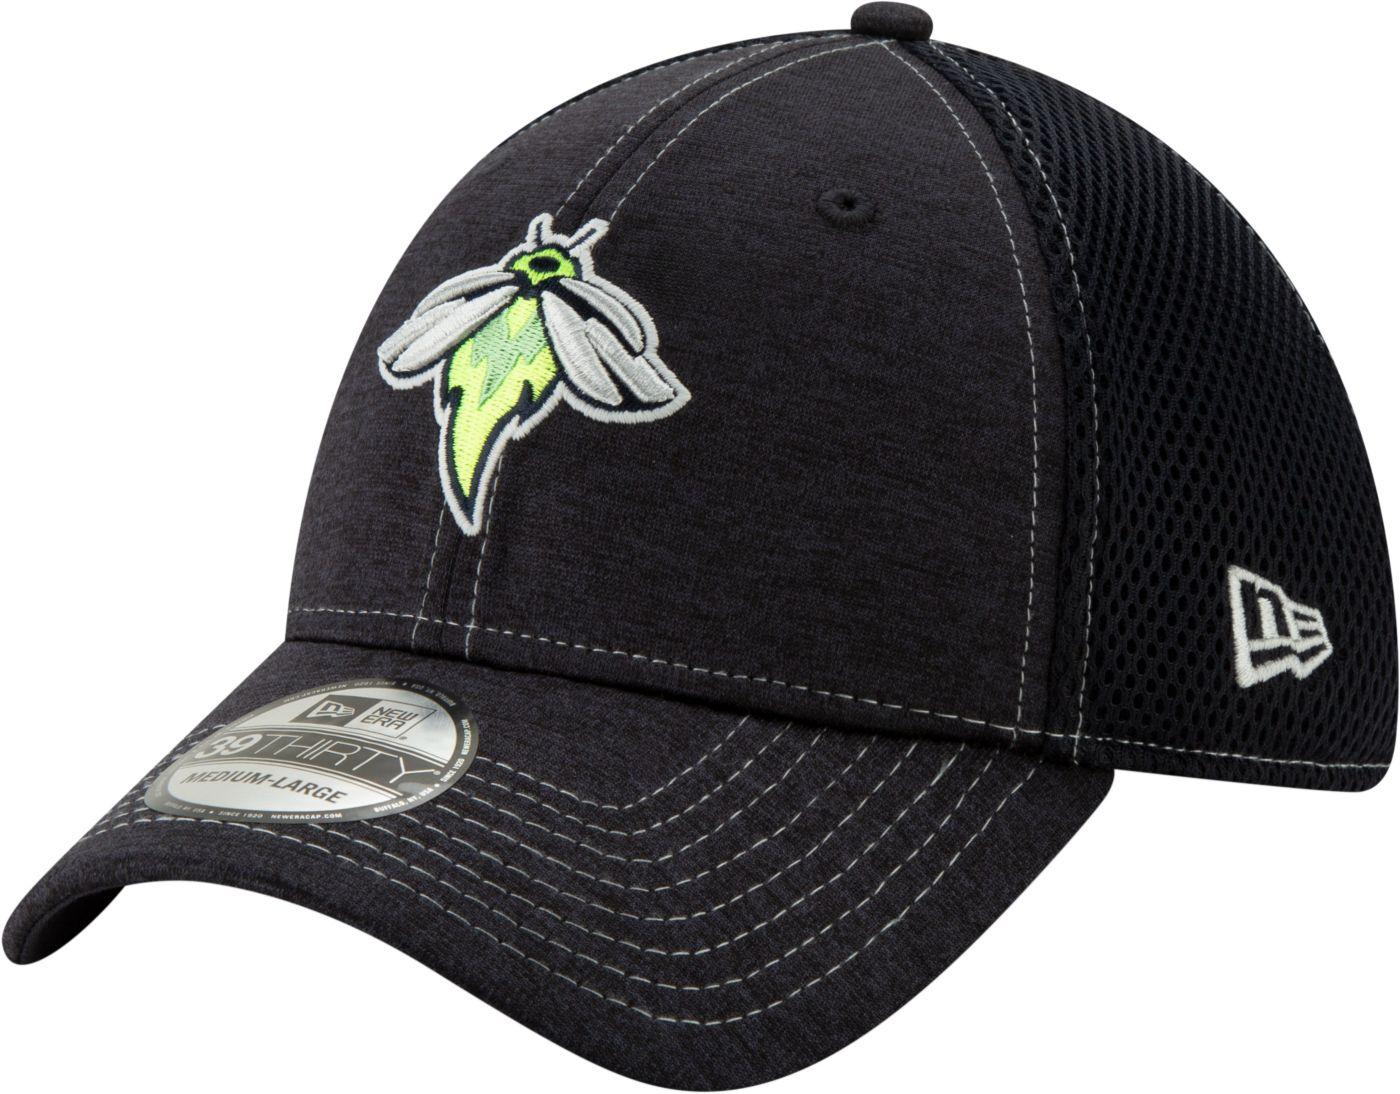 New Era Men's Columbia Fireflies 39Thirty Stretch Fit Hat